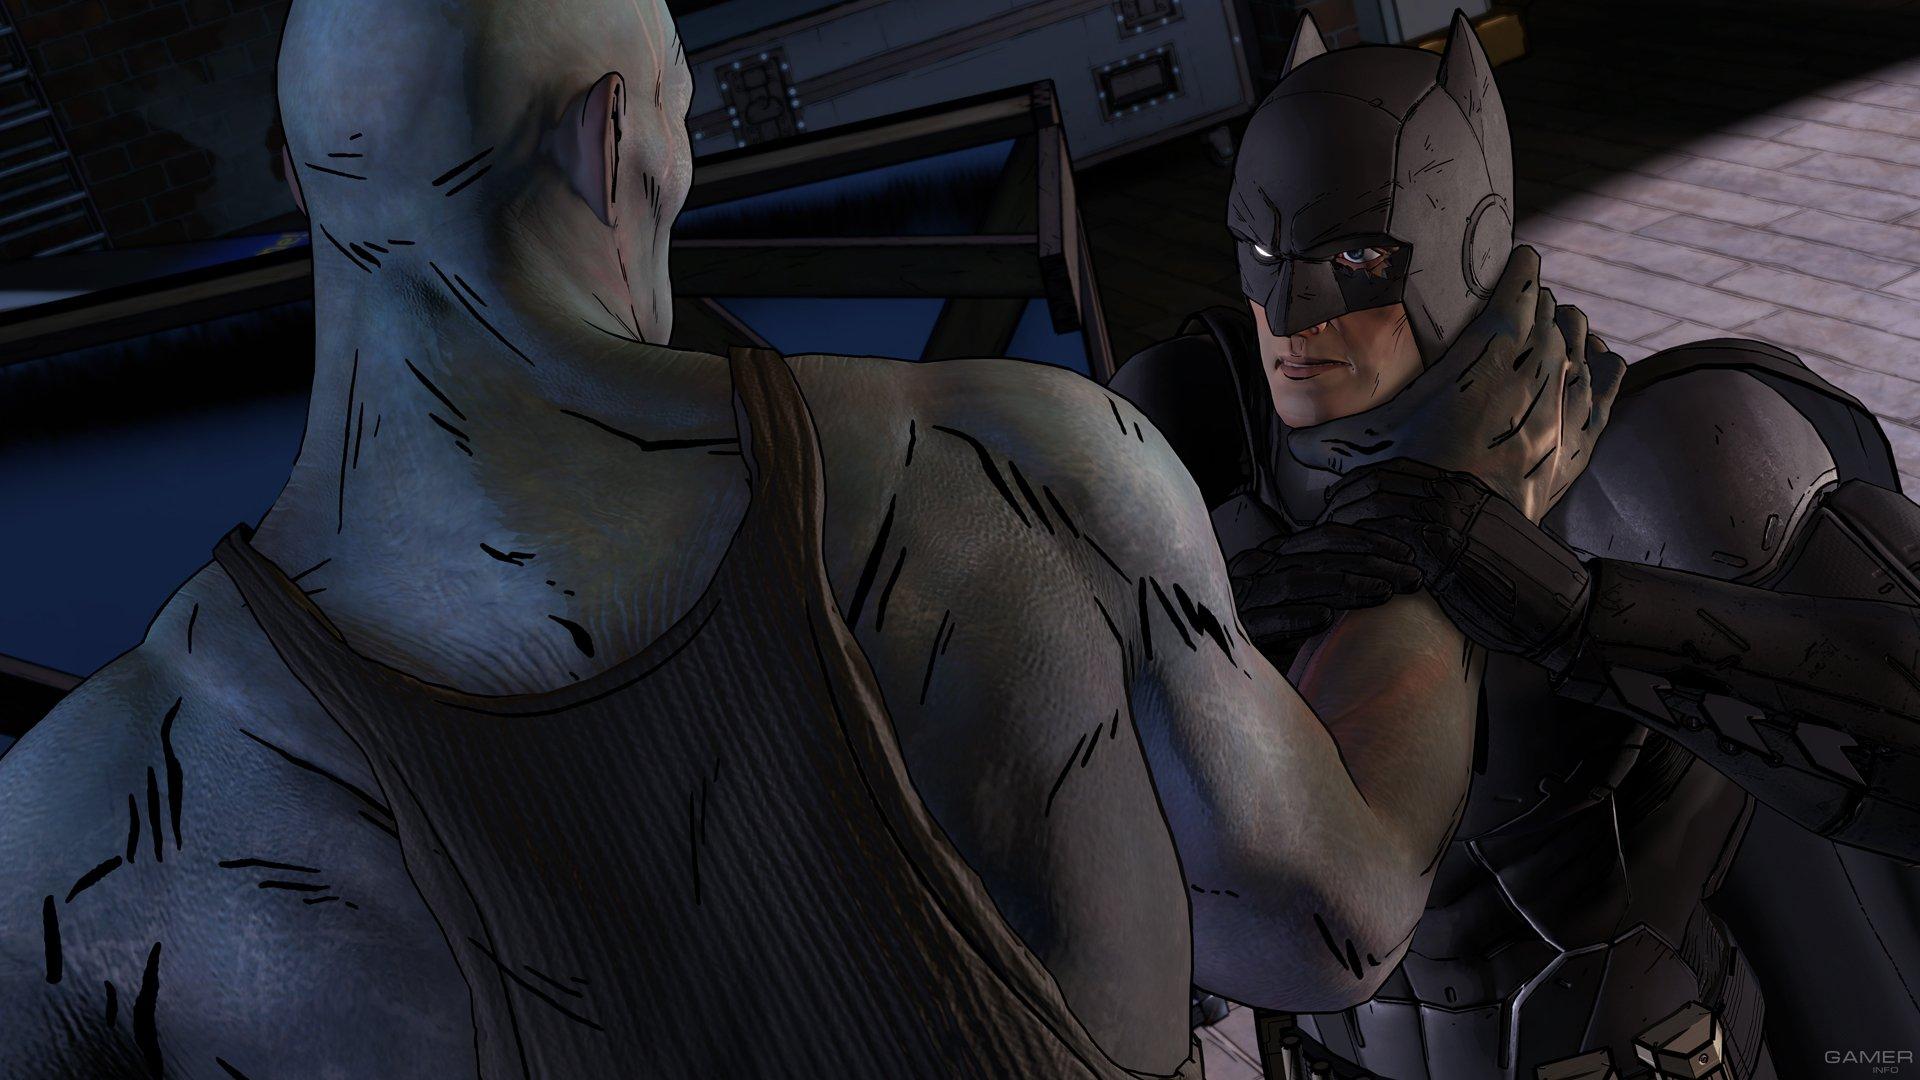 Скриншоты второго эпизода Batman - The Telltale Series